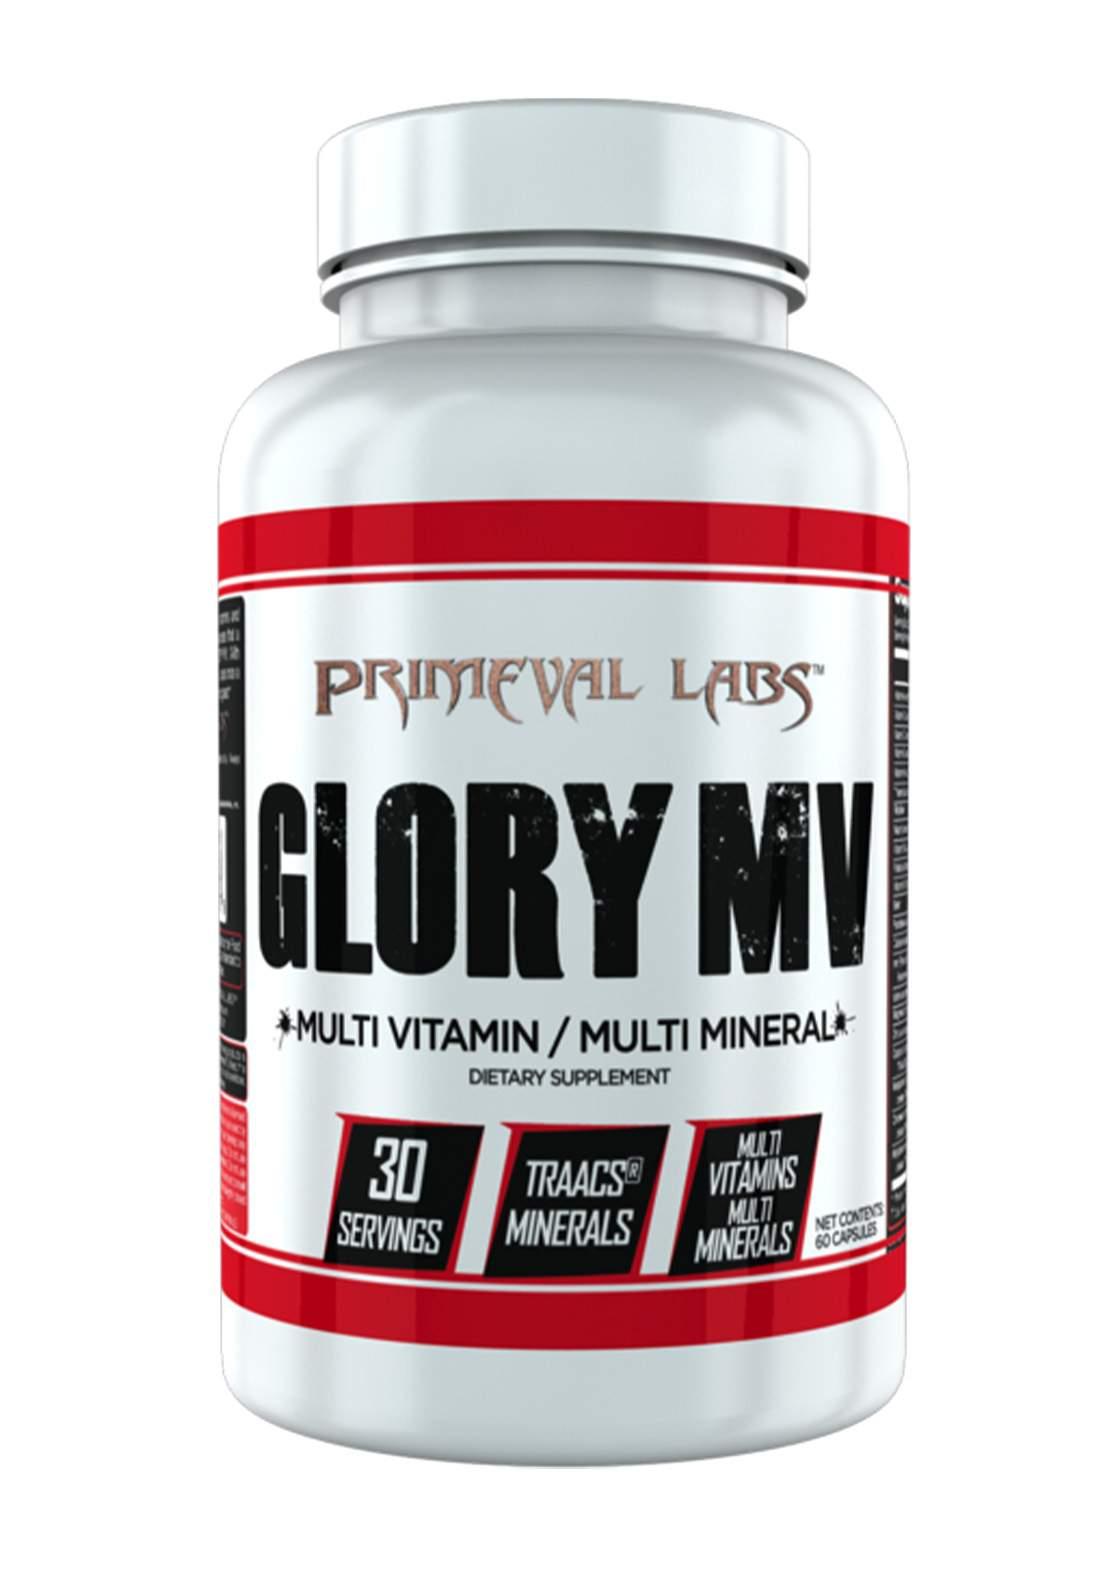 Primeval Labs Glory Mv Multi Vitamin Mineral - 30 Servings مكمل غذائي